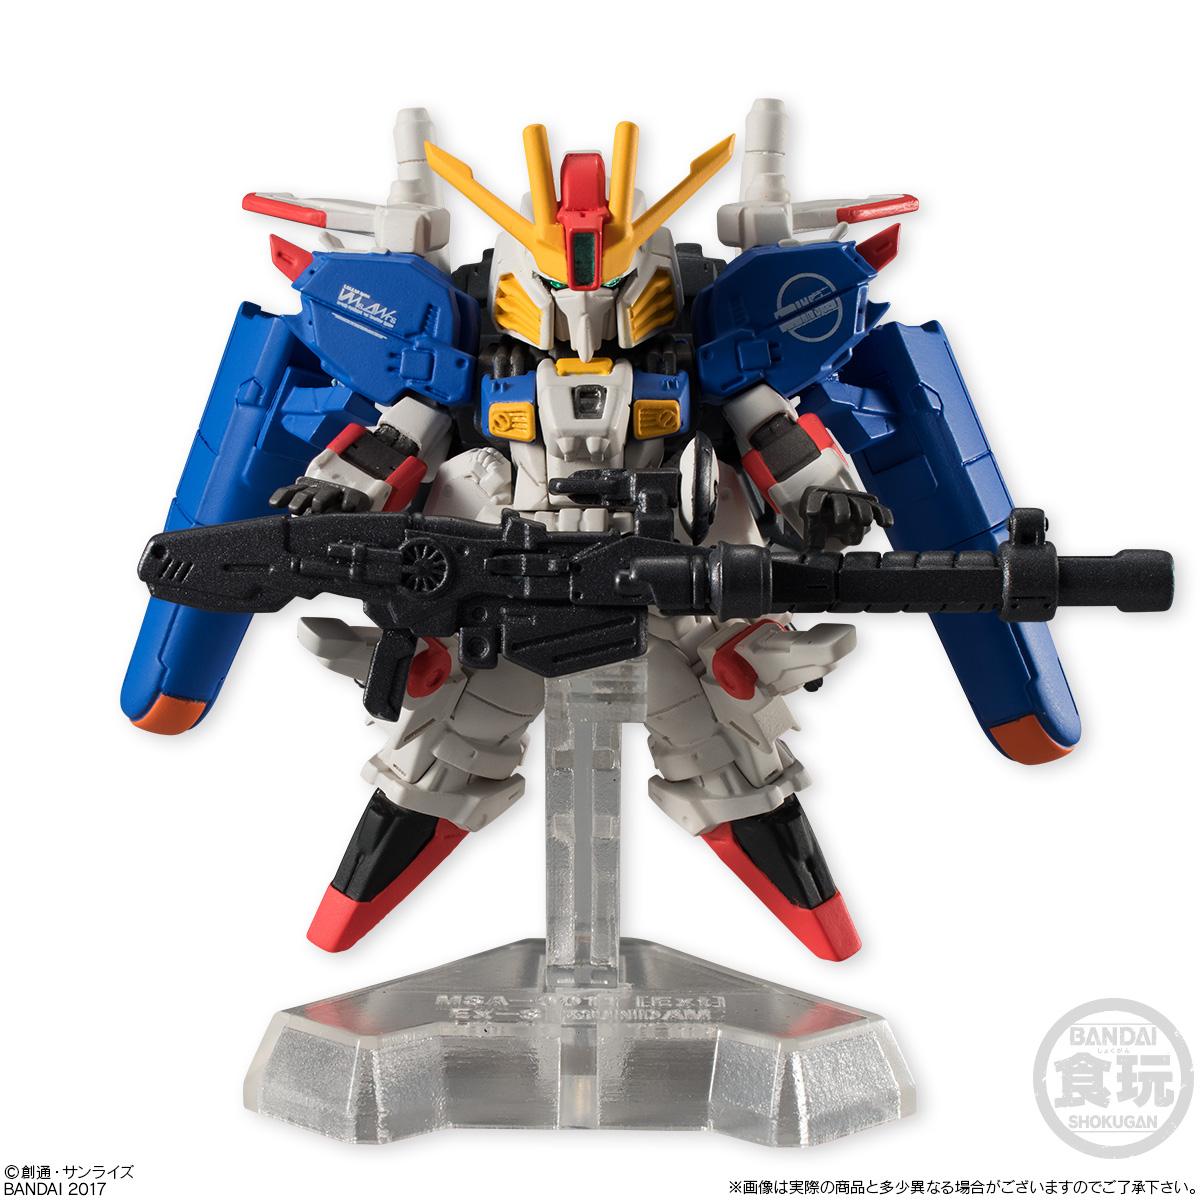 FW Gundam Converge EX 18 MSA-0011 EX-S Gundam figure Bandai Shokugan